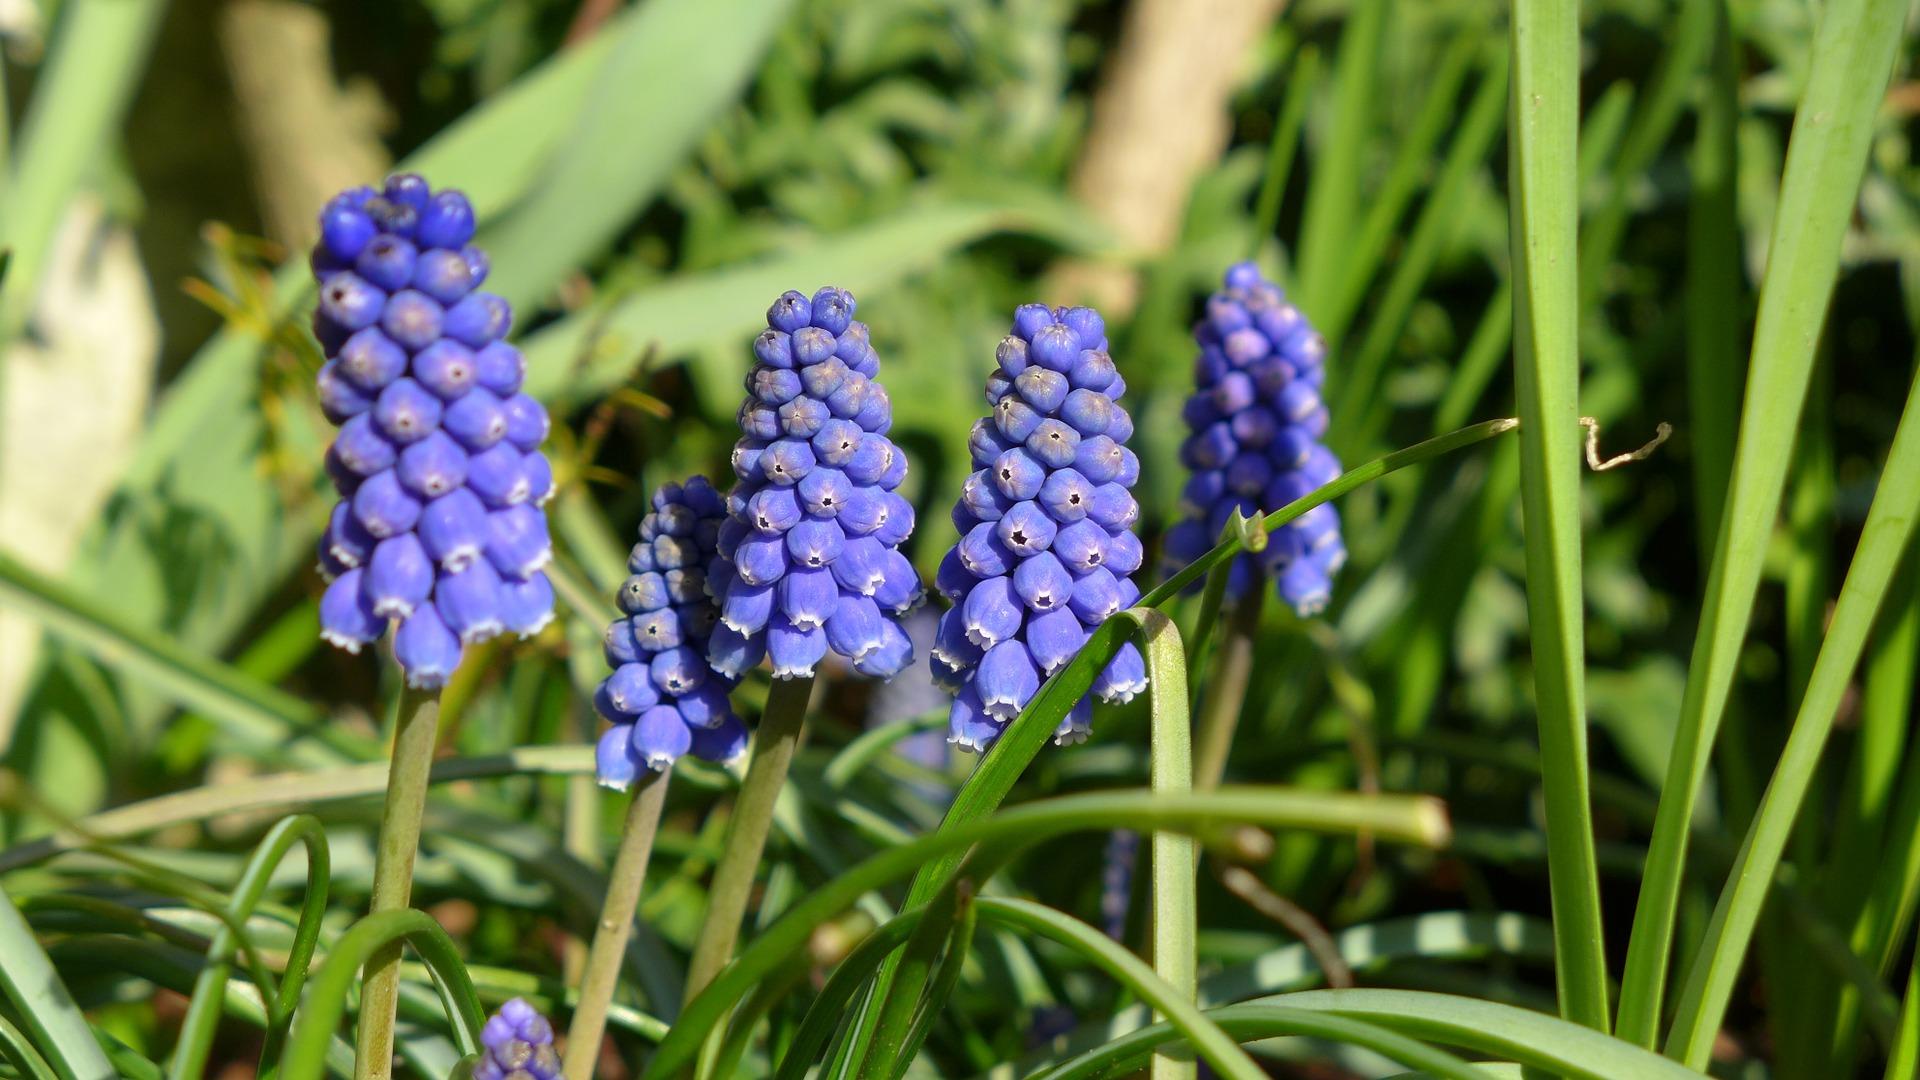 grape-hyacinth-1328332_1920jpg